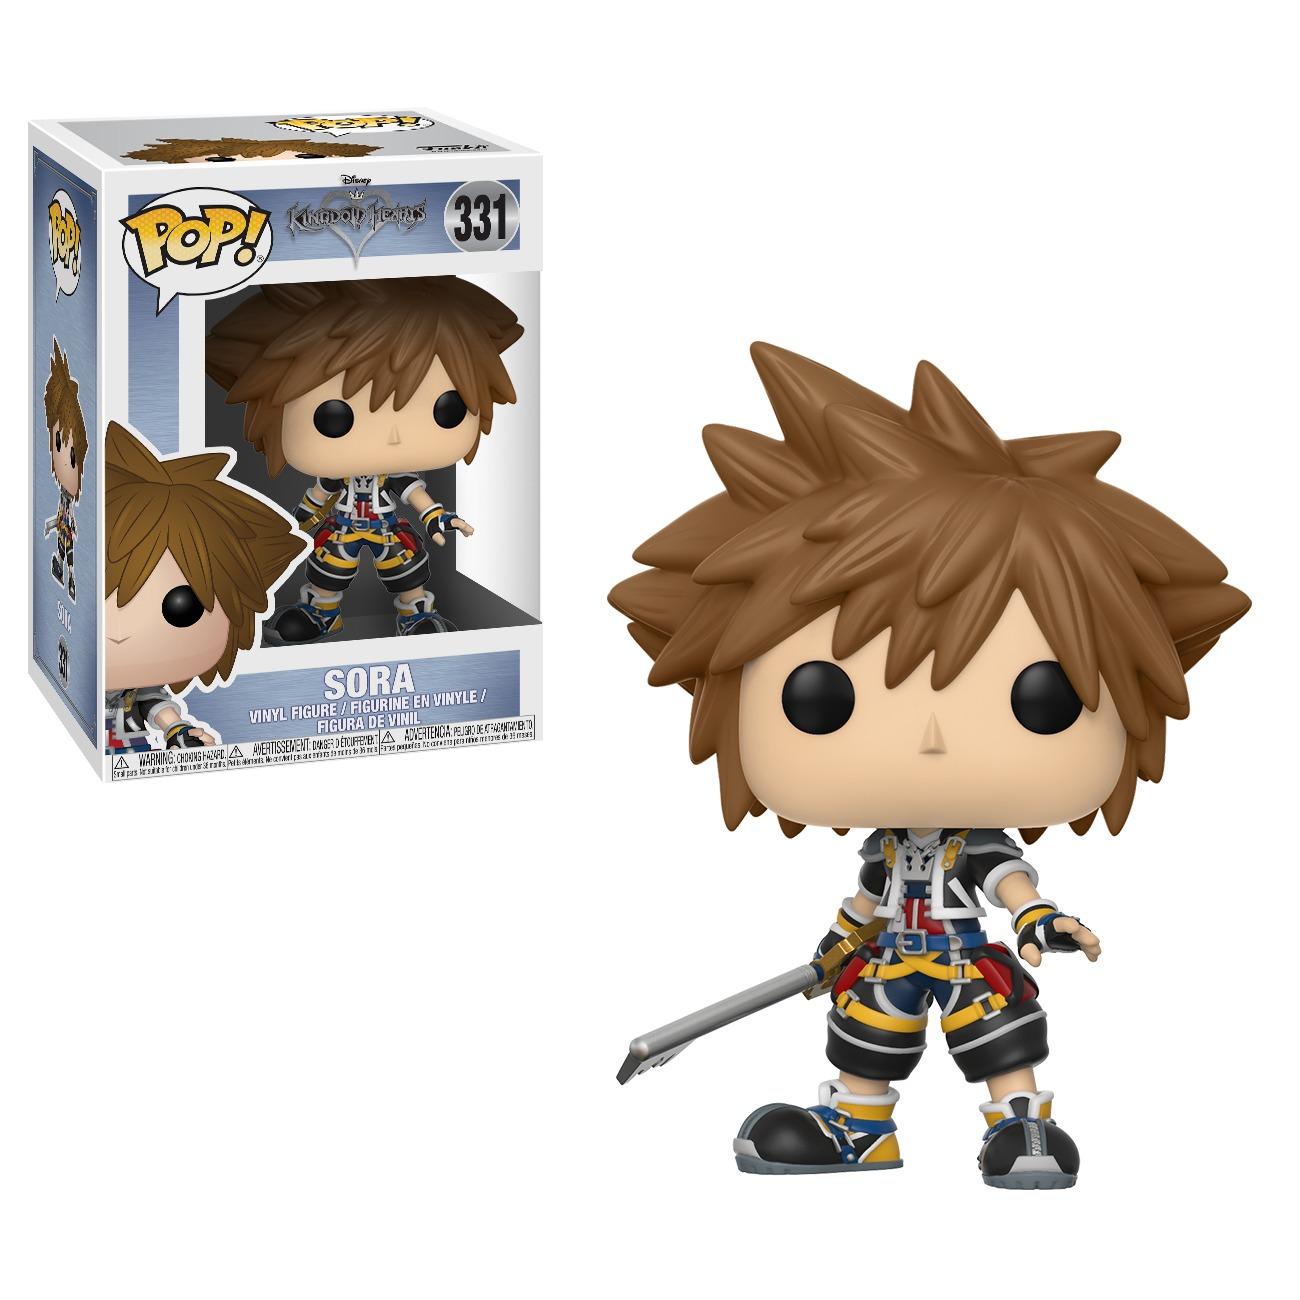 Kingdom Hearts - Sora Pop! Vinyl Figure image